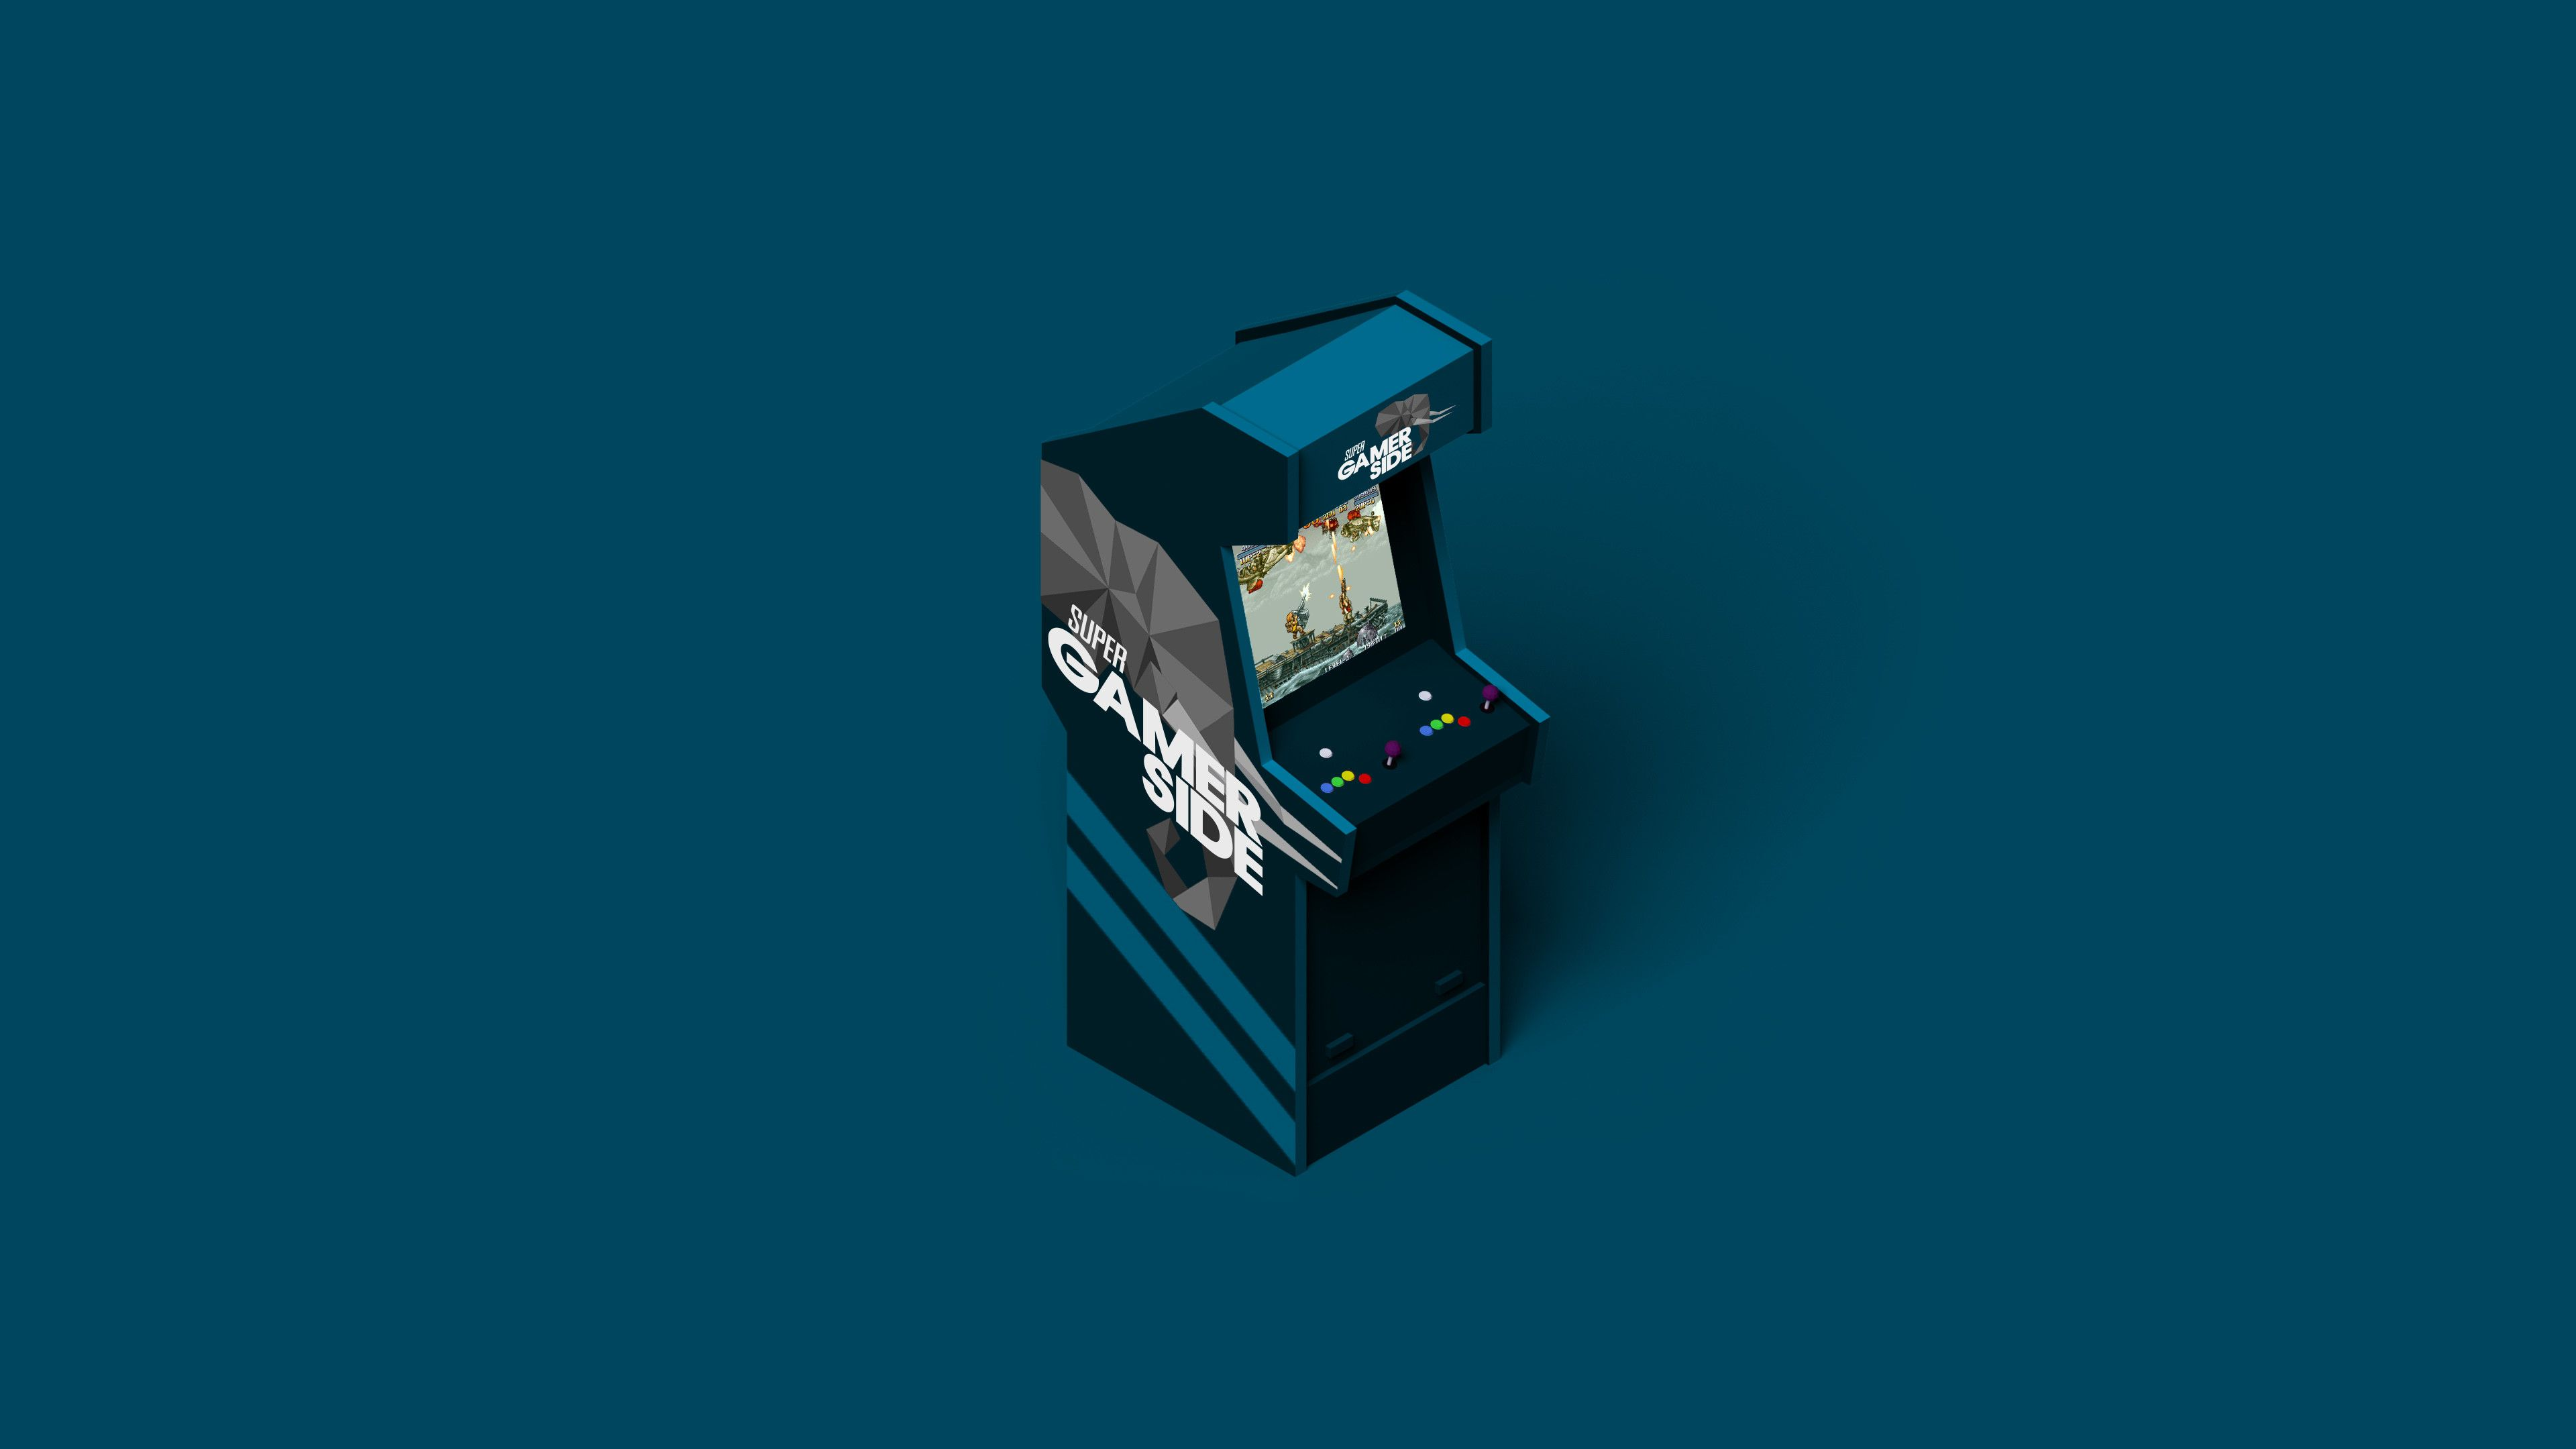 Arcade Gaming Minimalist Arcade Gaming Minimalist 4k Wallpaper Arcade Minimalist Wallpaper